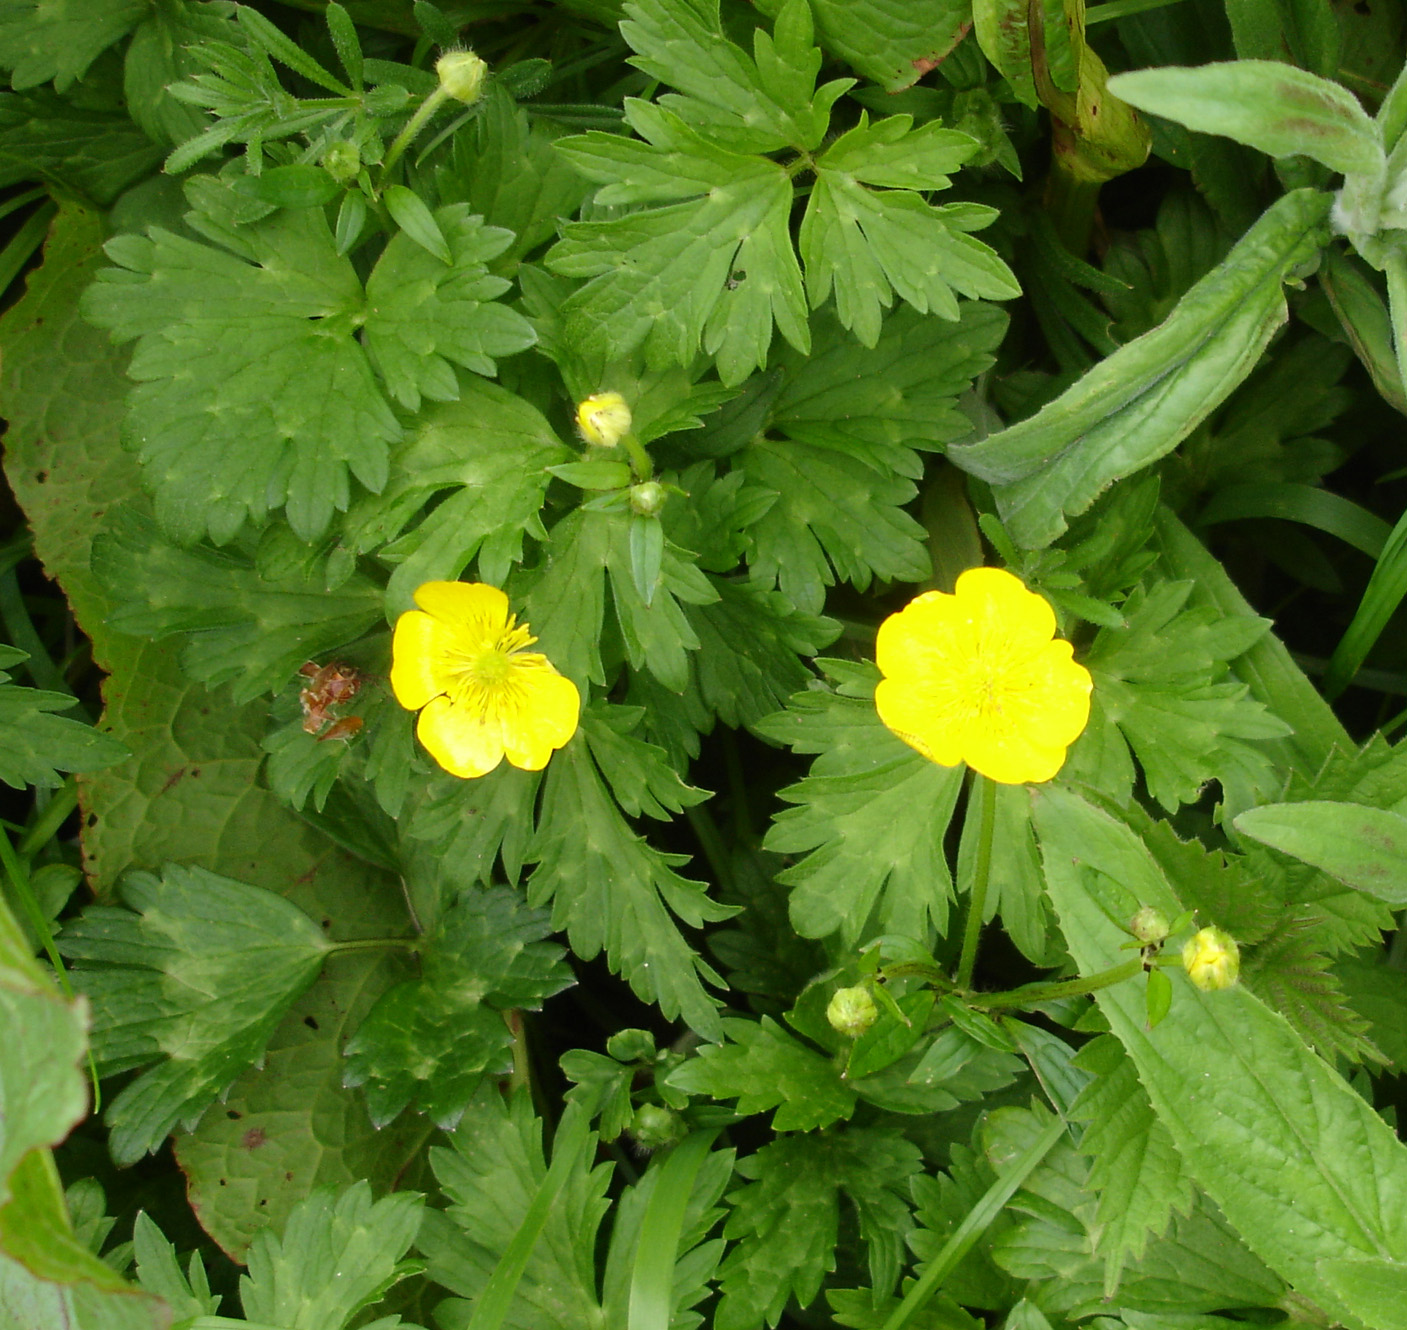 http://www.castlewardenflora.com/wp-content/uploads/2012/03/Ranunculus-repens-4.jpg